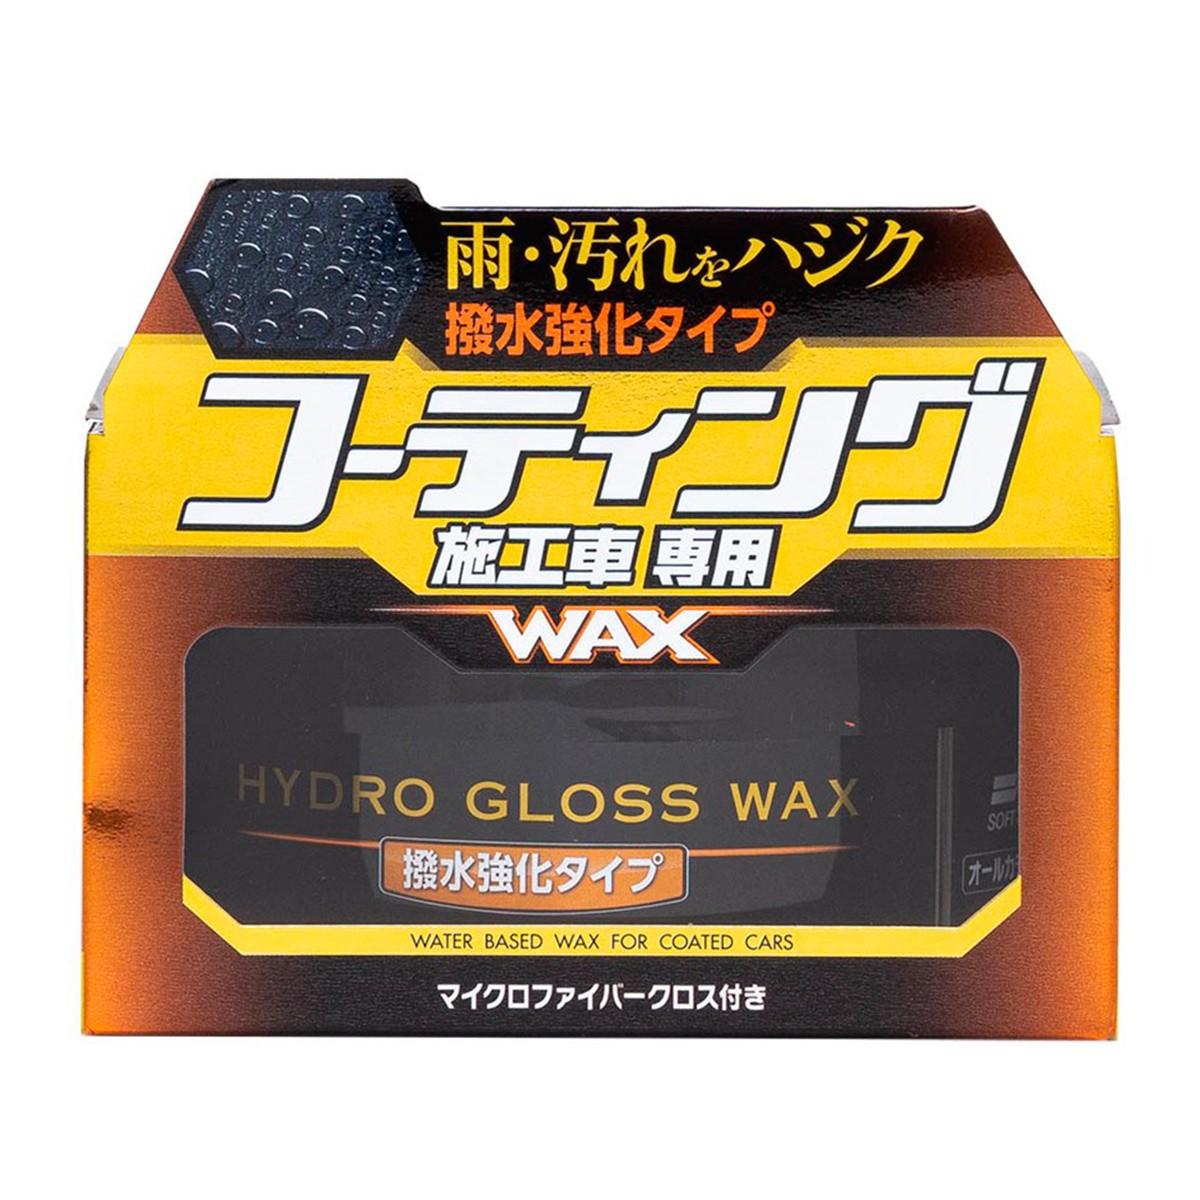 Cera Hydro Gloss 150g - Soft99